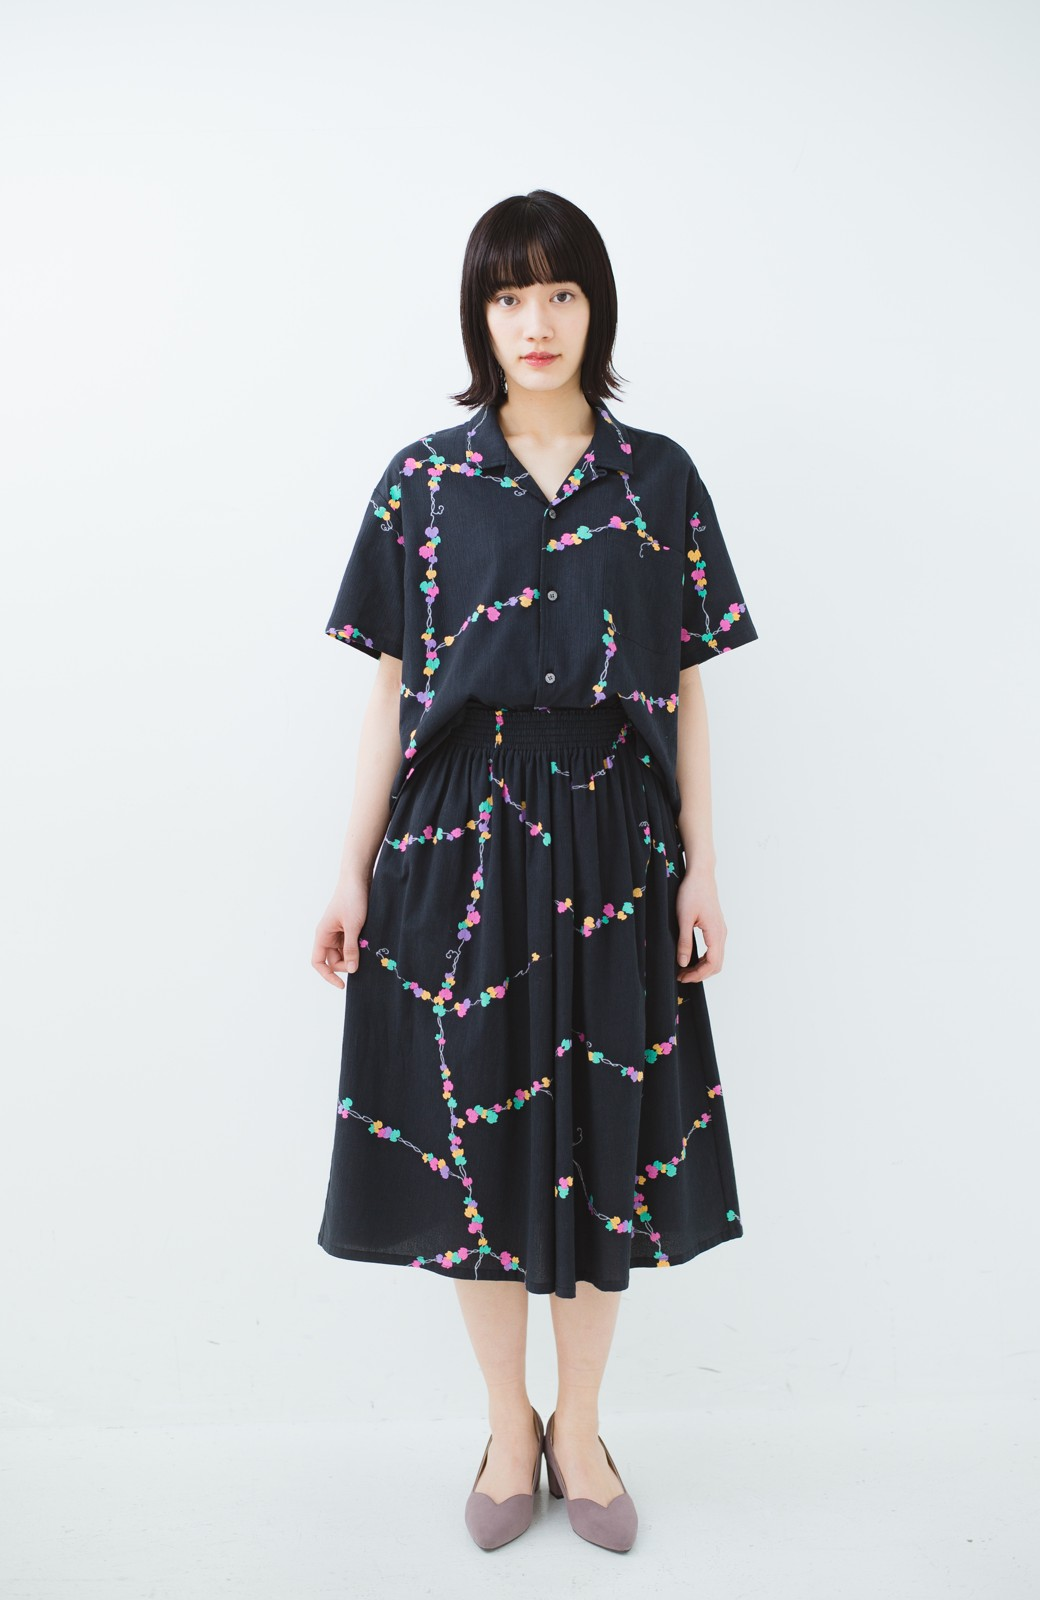 haco! 京都の浴衣屋さんと作った浴衣生地のスカート <ブラック系その他>の商品写真12